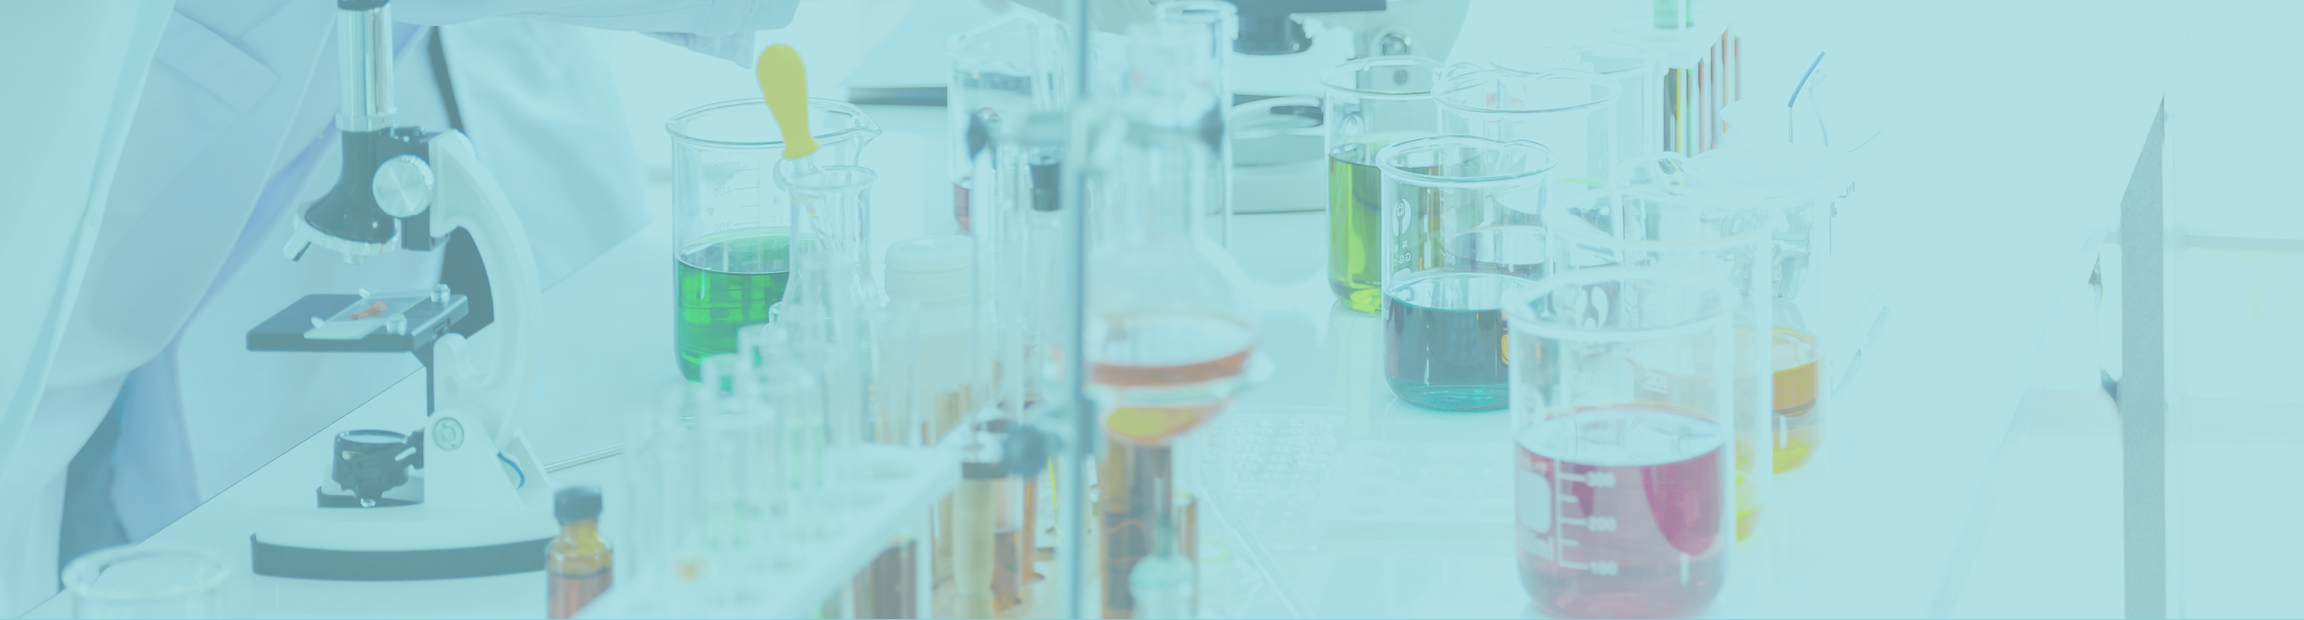 wissenschaft-vermitteln-afin-ts-forschungsinstitut-gmbh